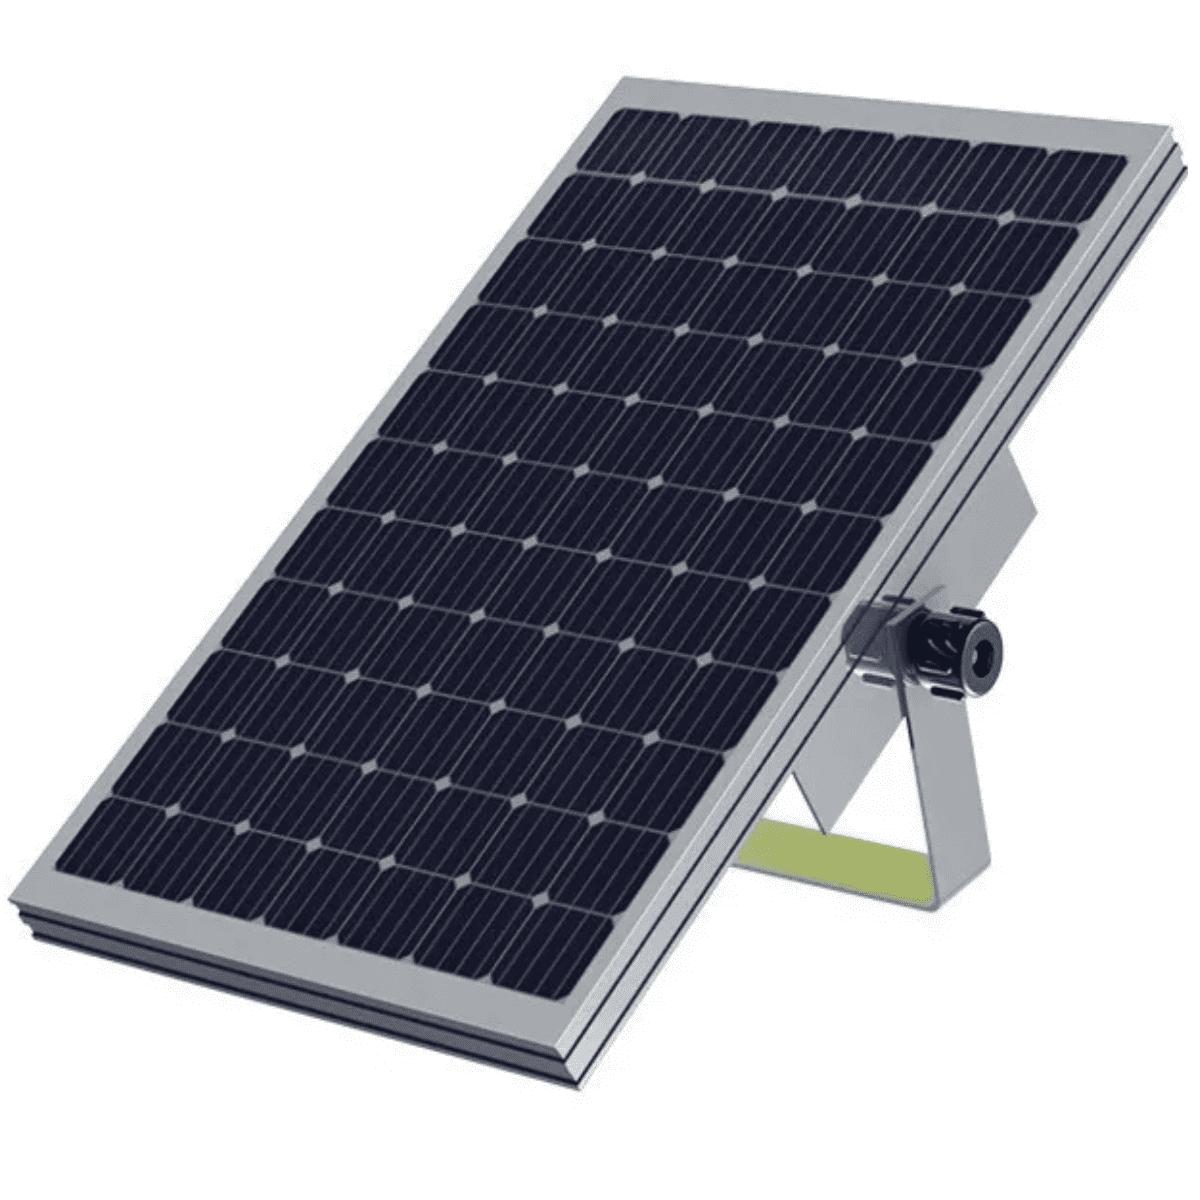 Energizador De Cerca Eletrica Rural Kit Solar Completo  - Ambientude Agro e Pet